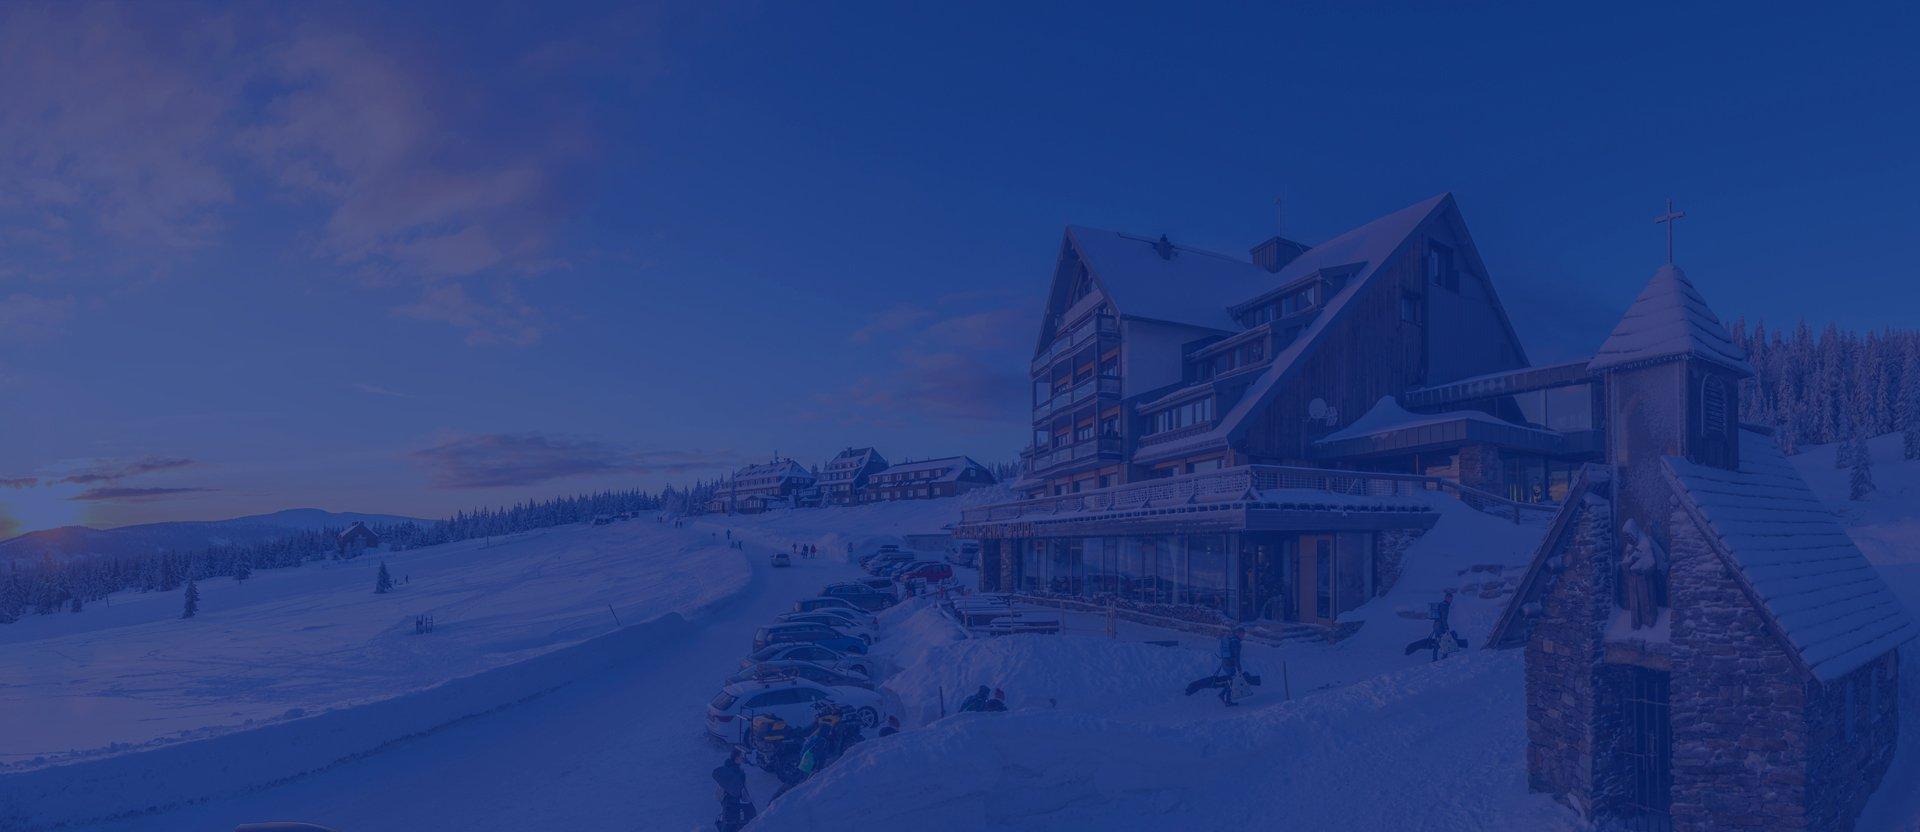 Resort Sv. František Erlebachova bouda a Josefova bouda